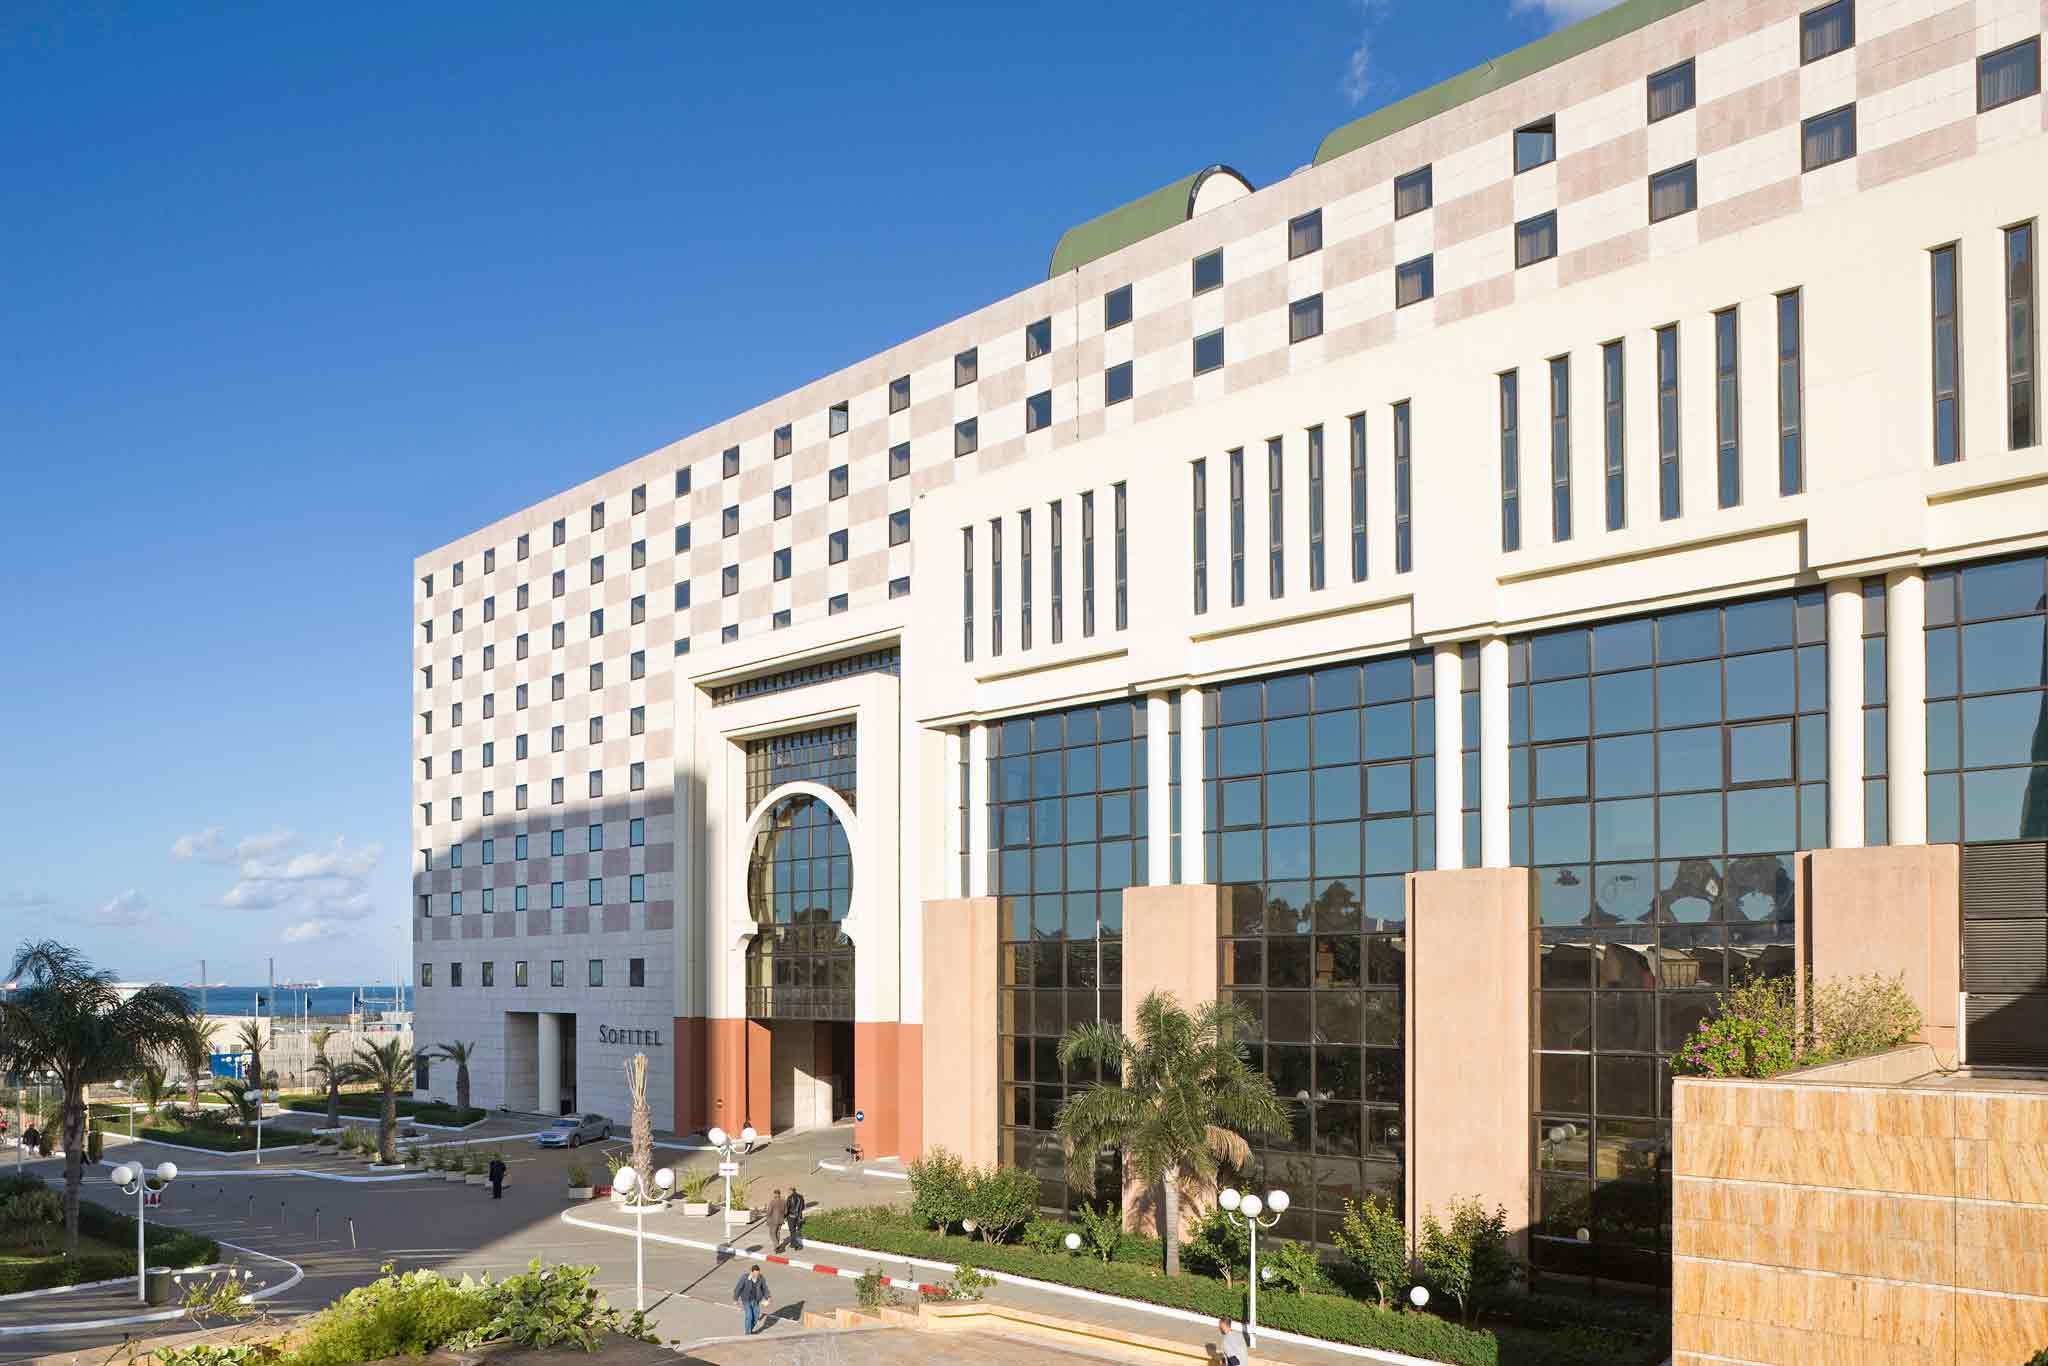 Hotel Sofitel Algiers Hamma Garden